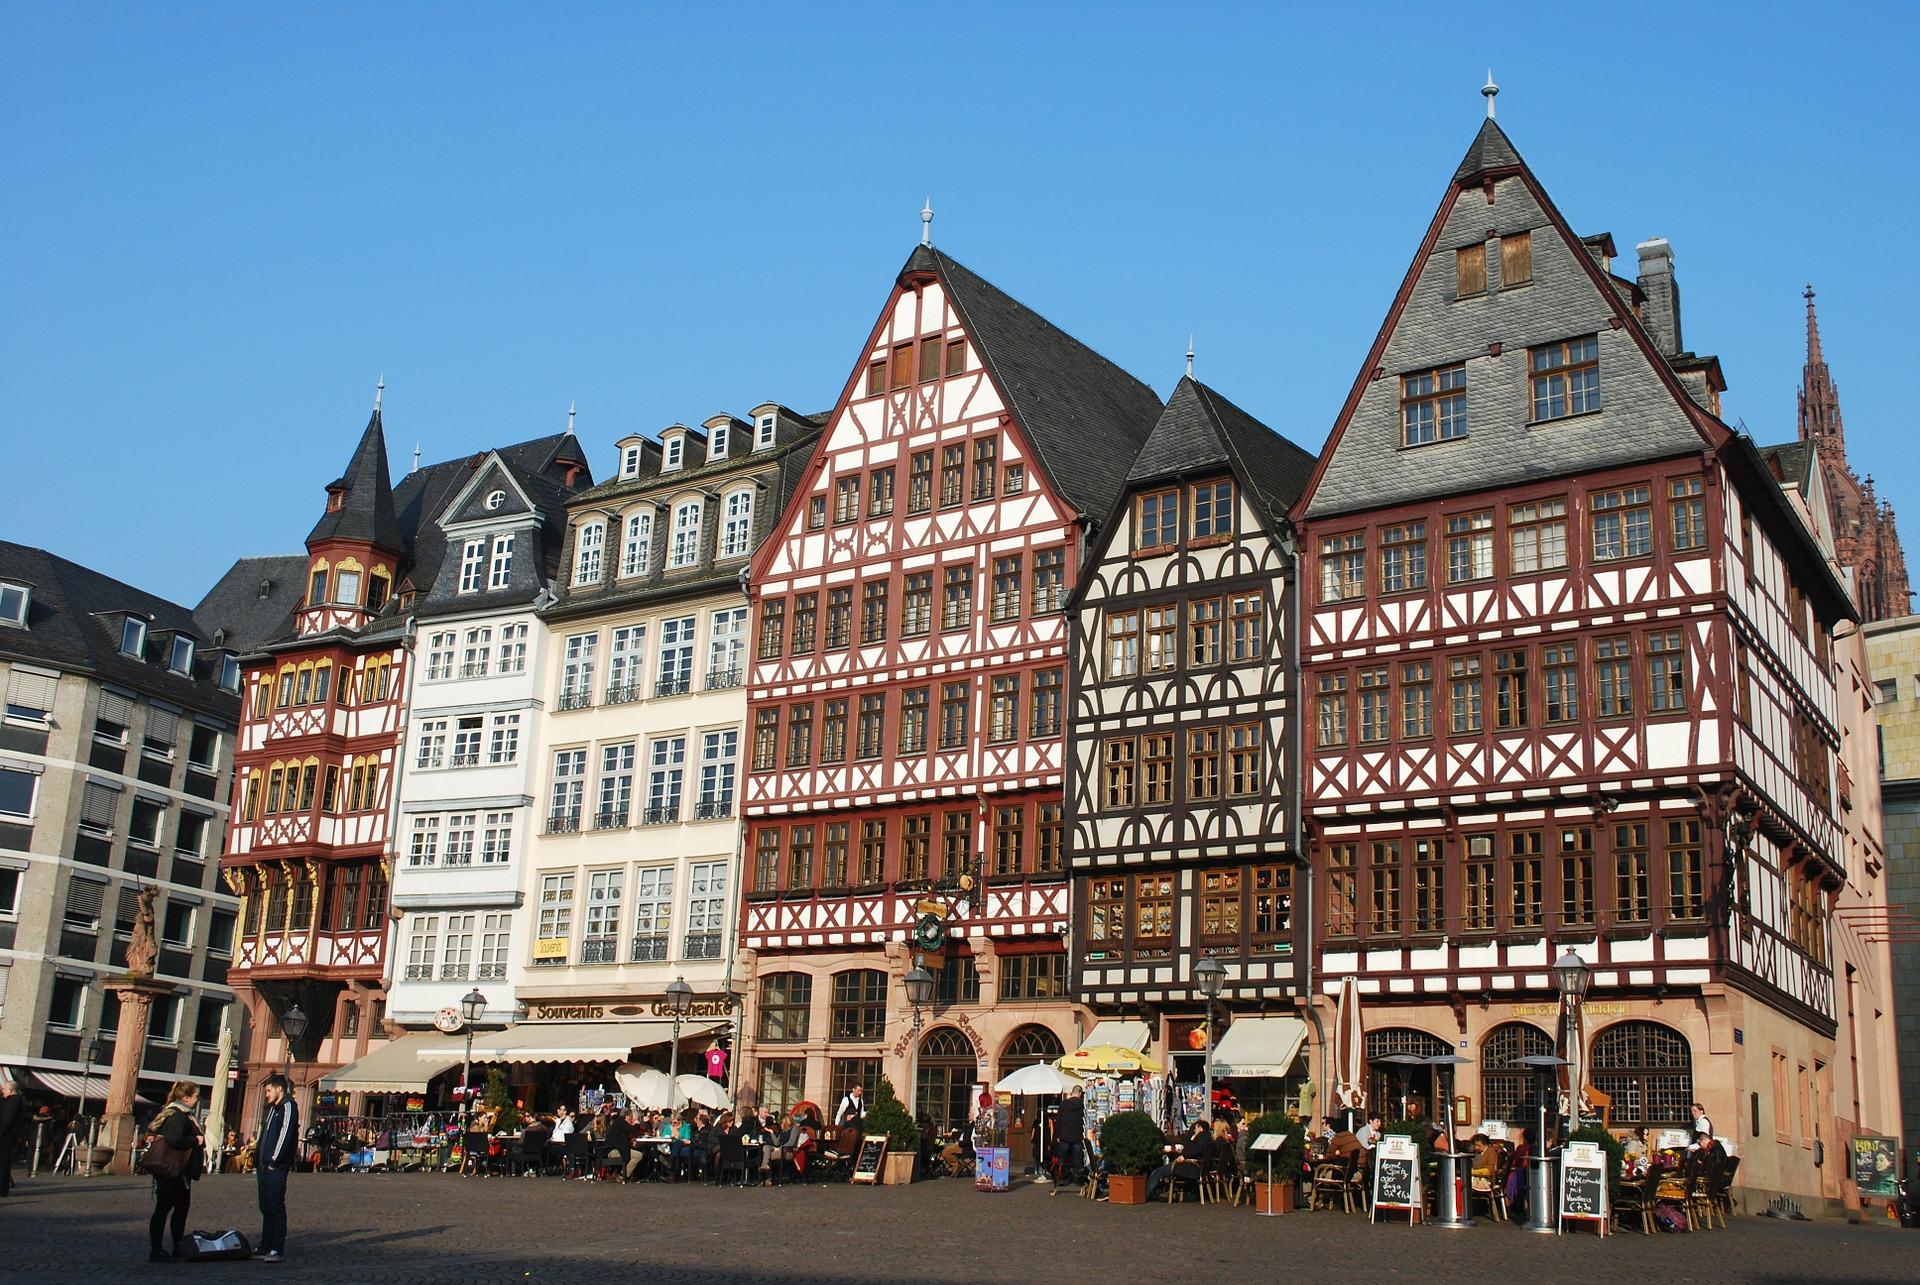 frankfurt-282598_1920.jpg